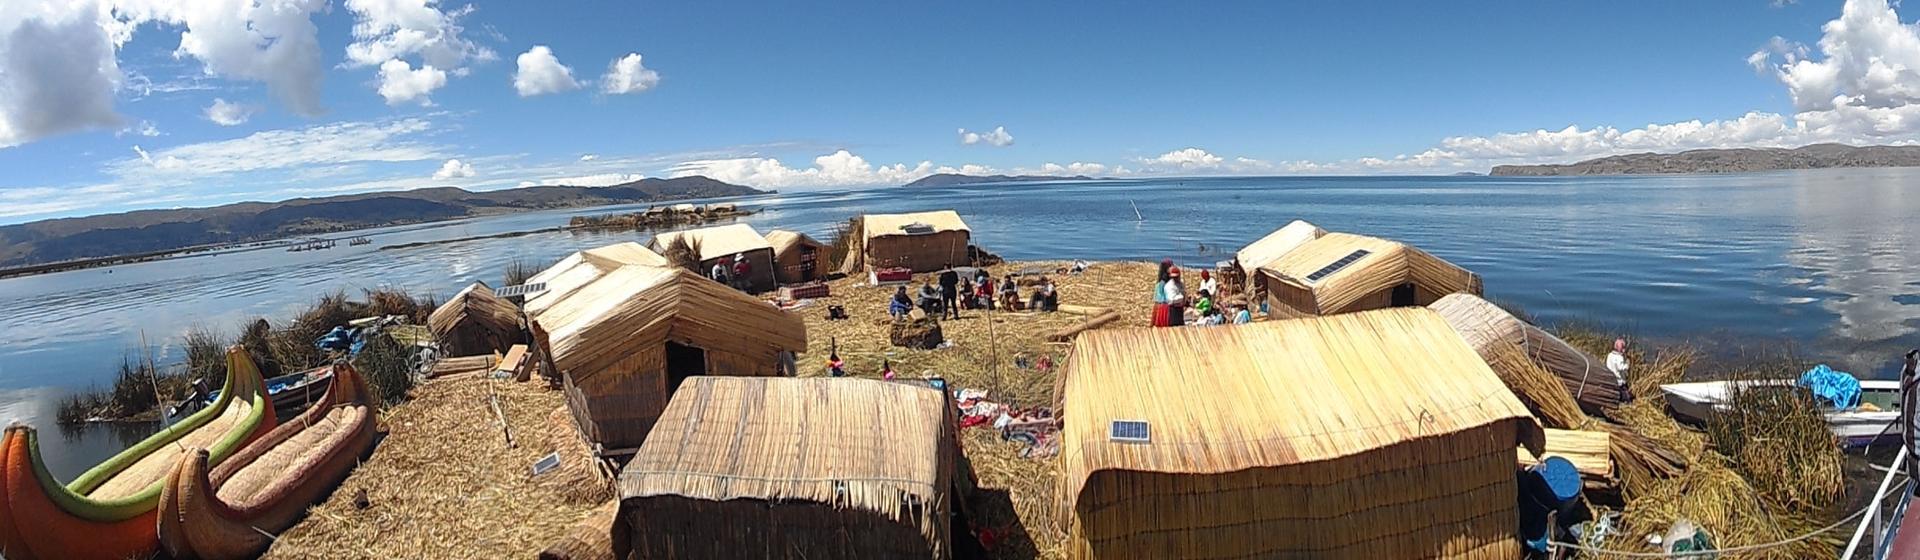 Titicaca el dolor de viracocha we are water for We are water